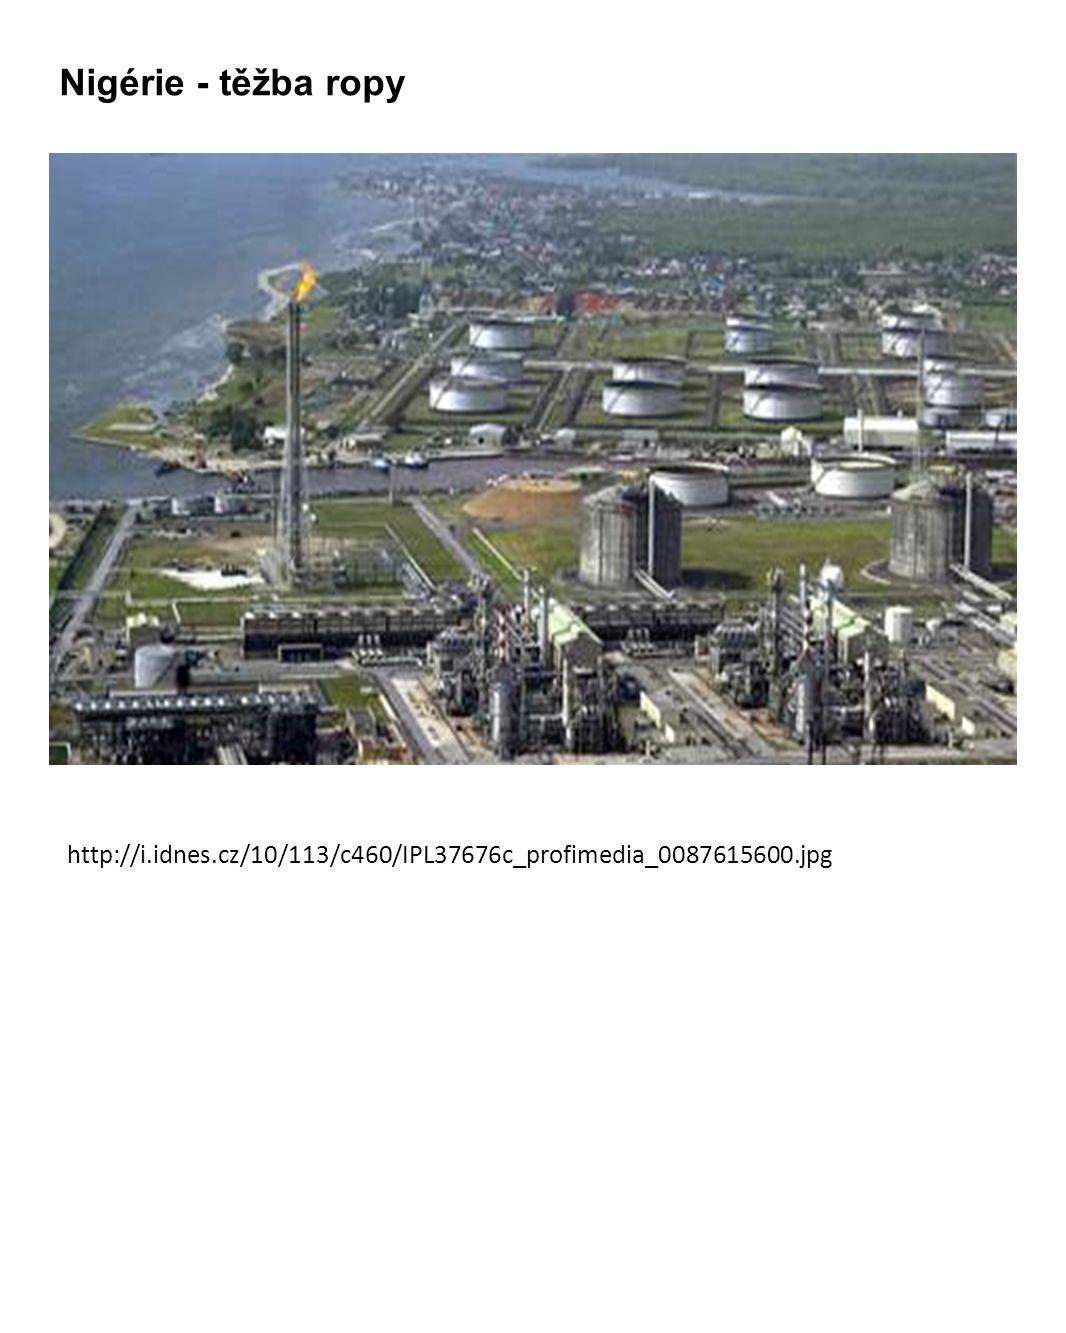 http://i.idnes.cz/10/113/c460/IPL37676c_profimedia_0087615600.jpg Nigérie - těžba ropy